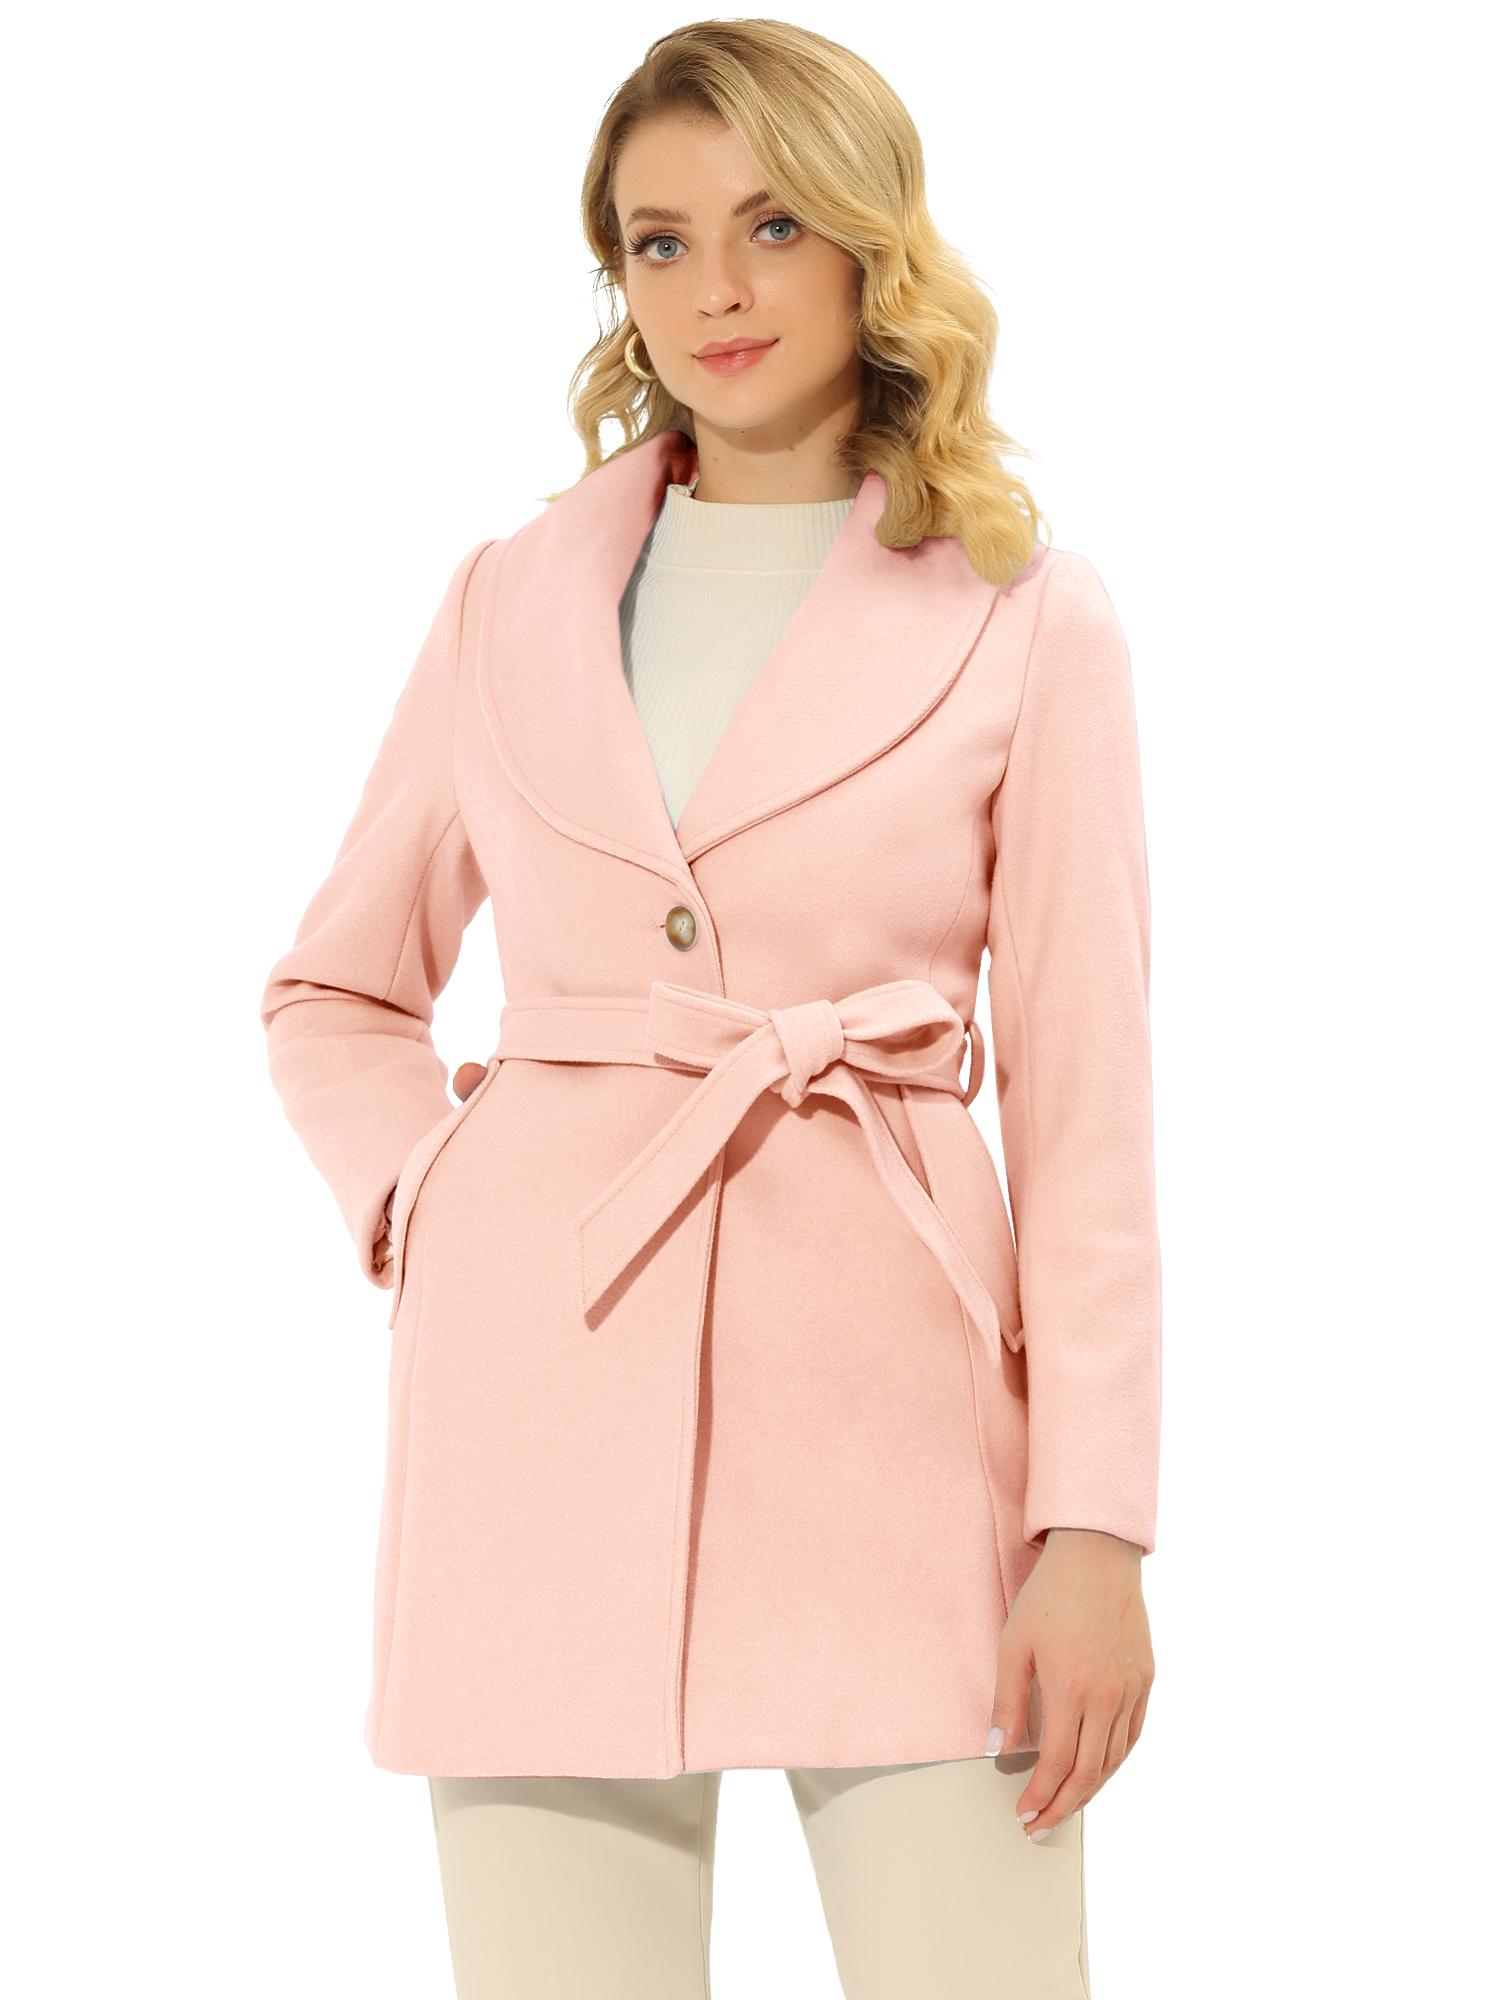 Allegra K Women's Casual Cute Slim Single Breasted Belt Coat Pink XS (US 2)